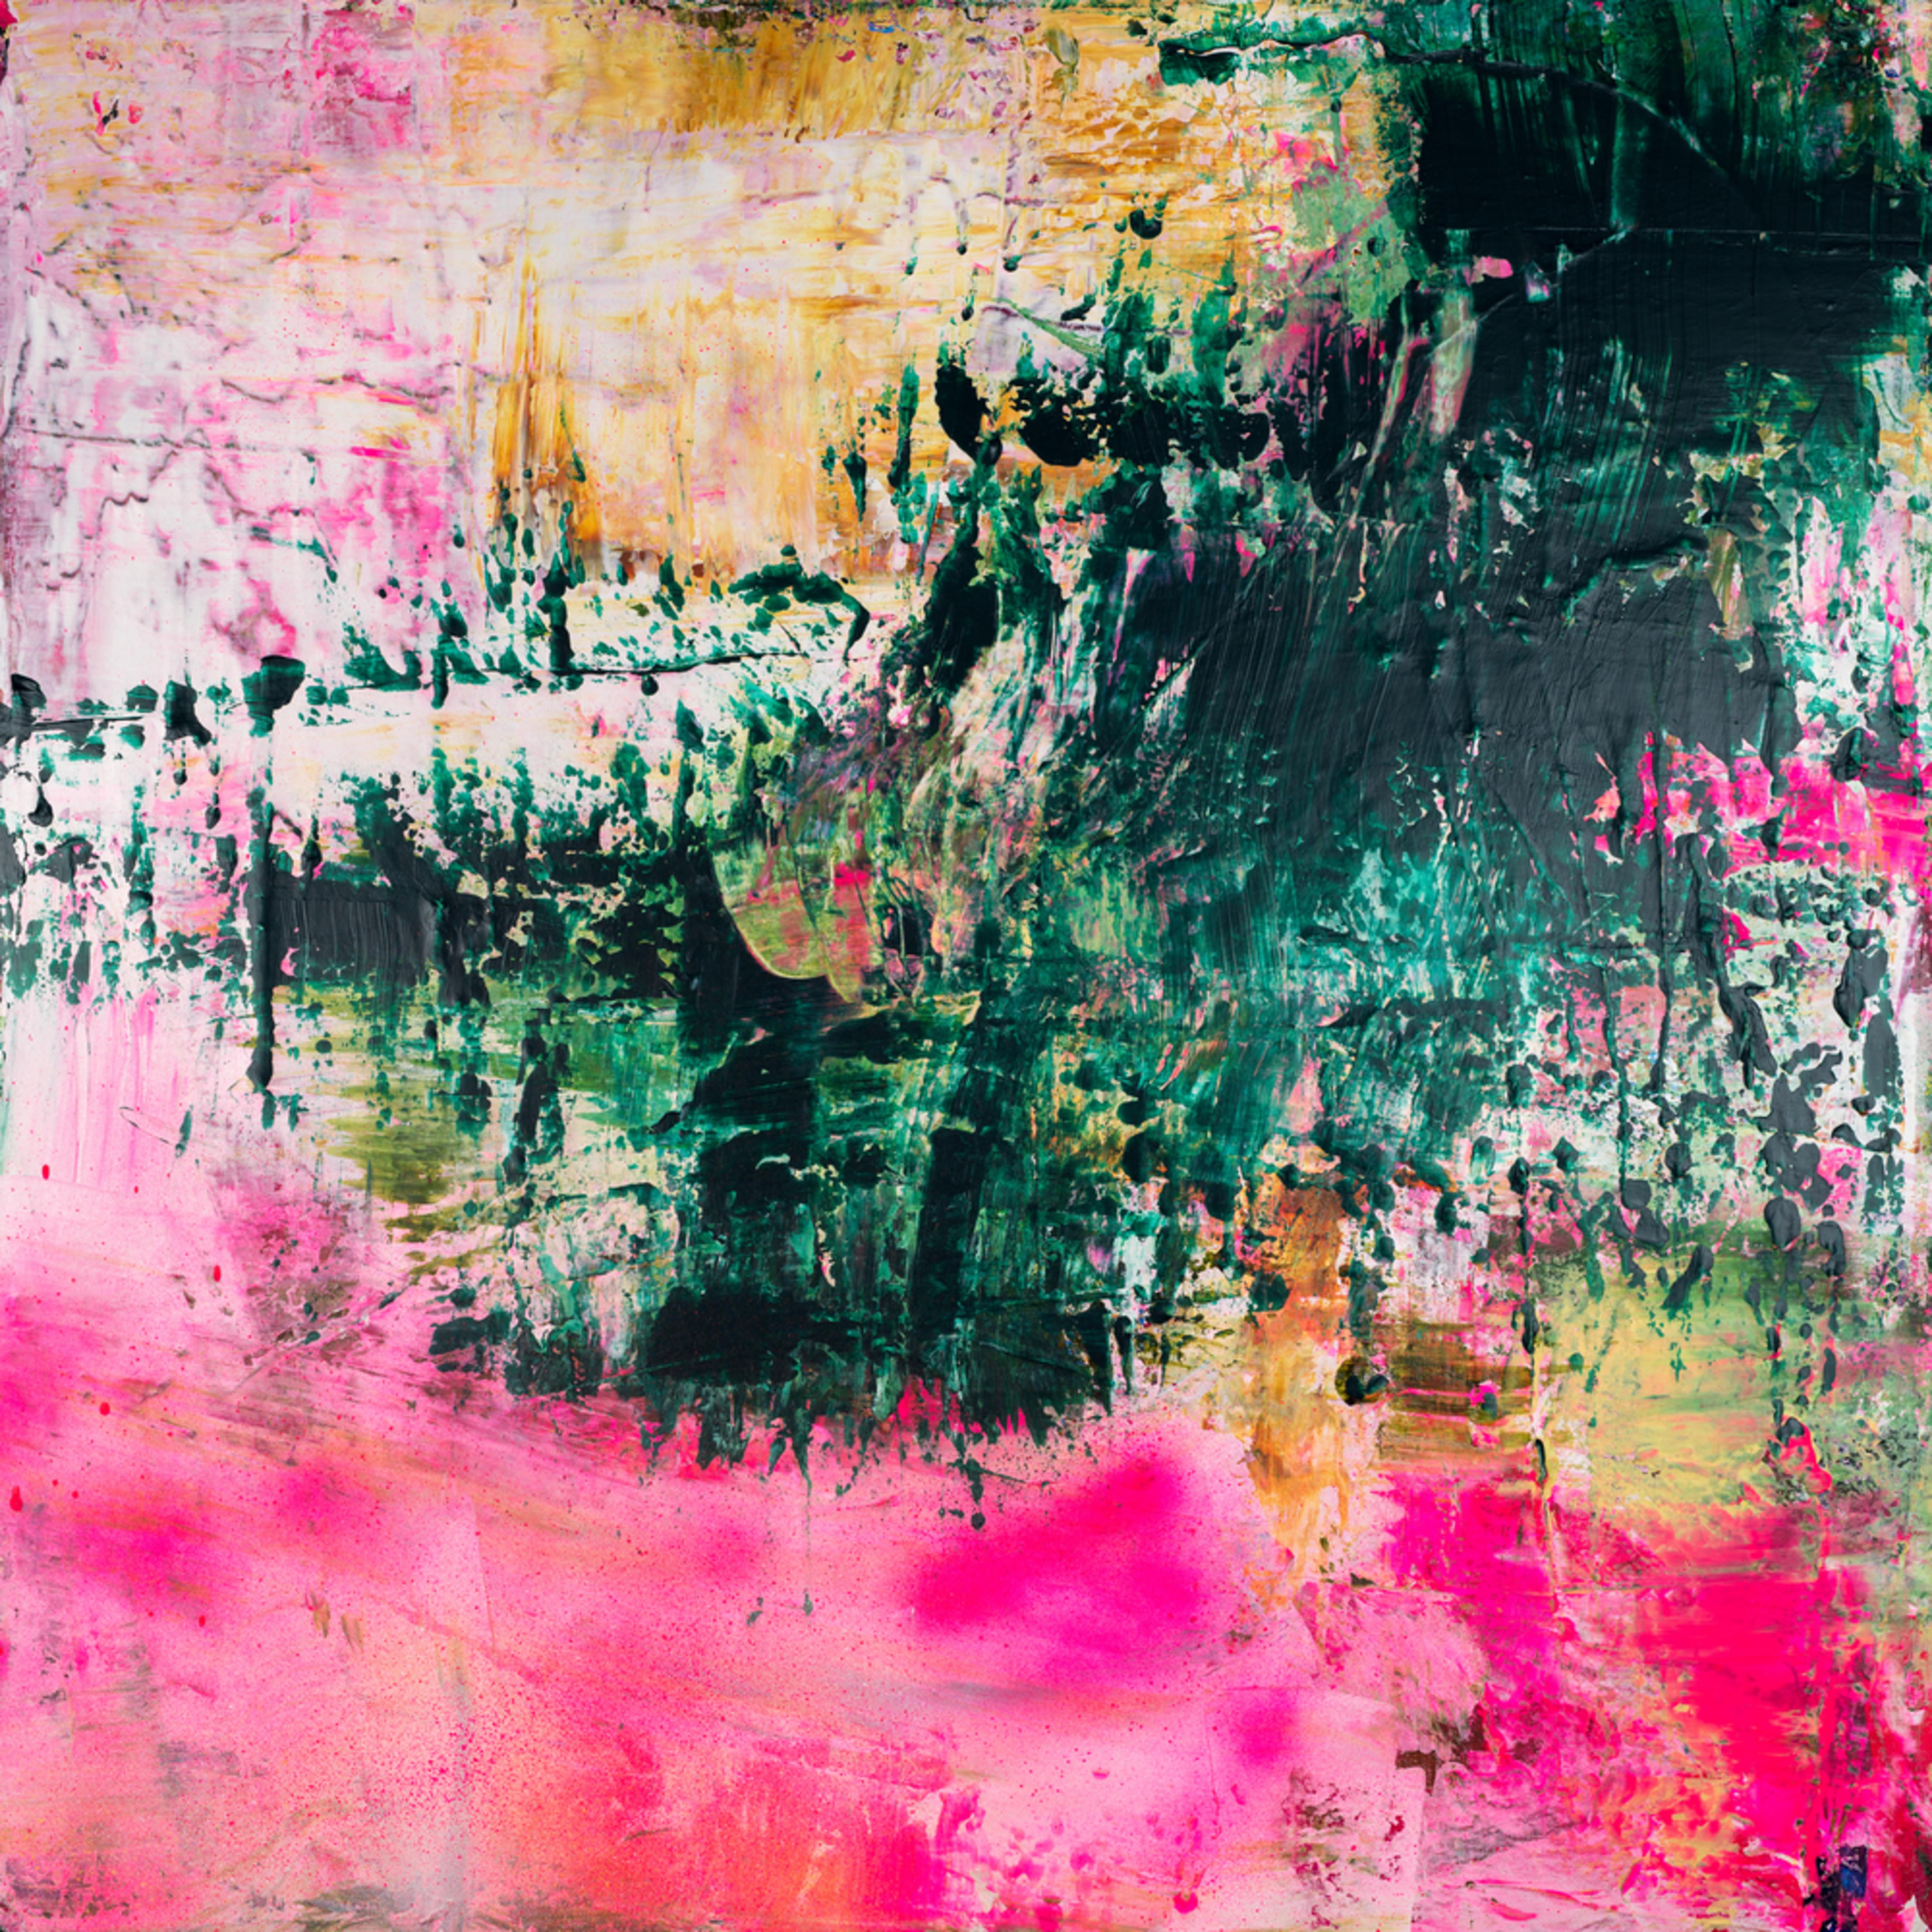 Eadaoin glynn 2020 i lie beneath her soft petals pink against my cheek acrylic spray paint on canvas 100x100cm 2020 high res ipodfu